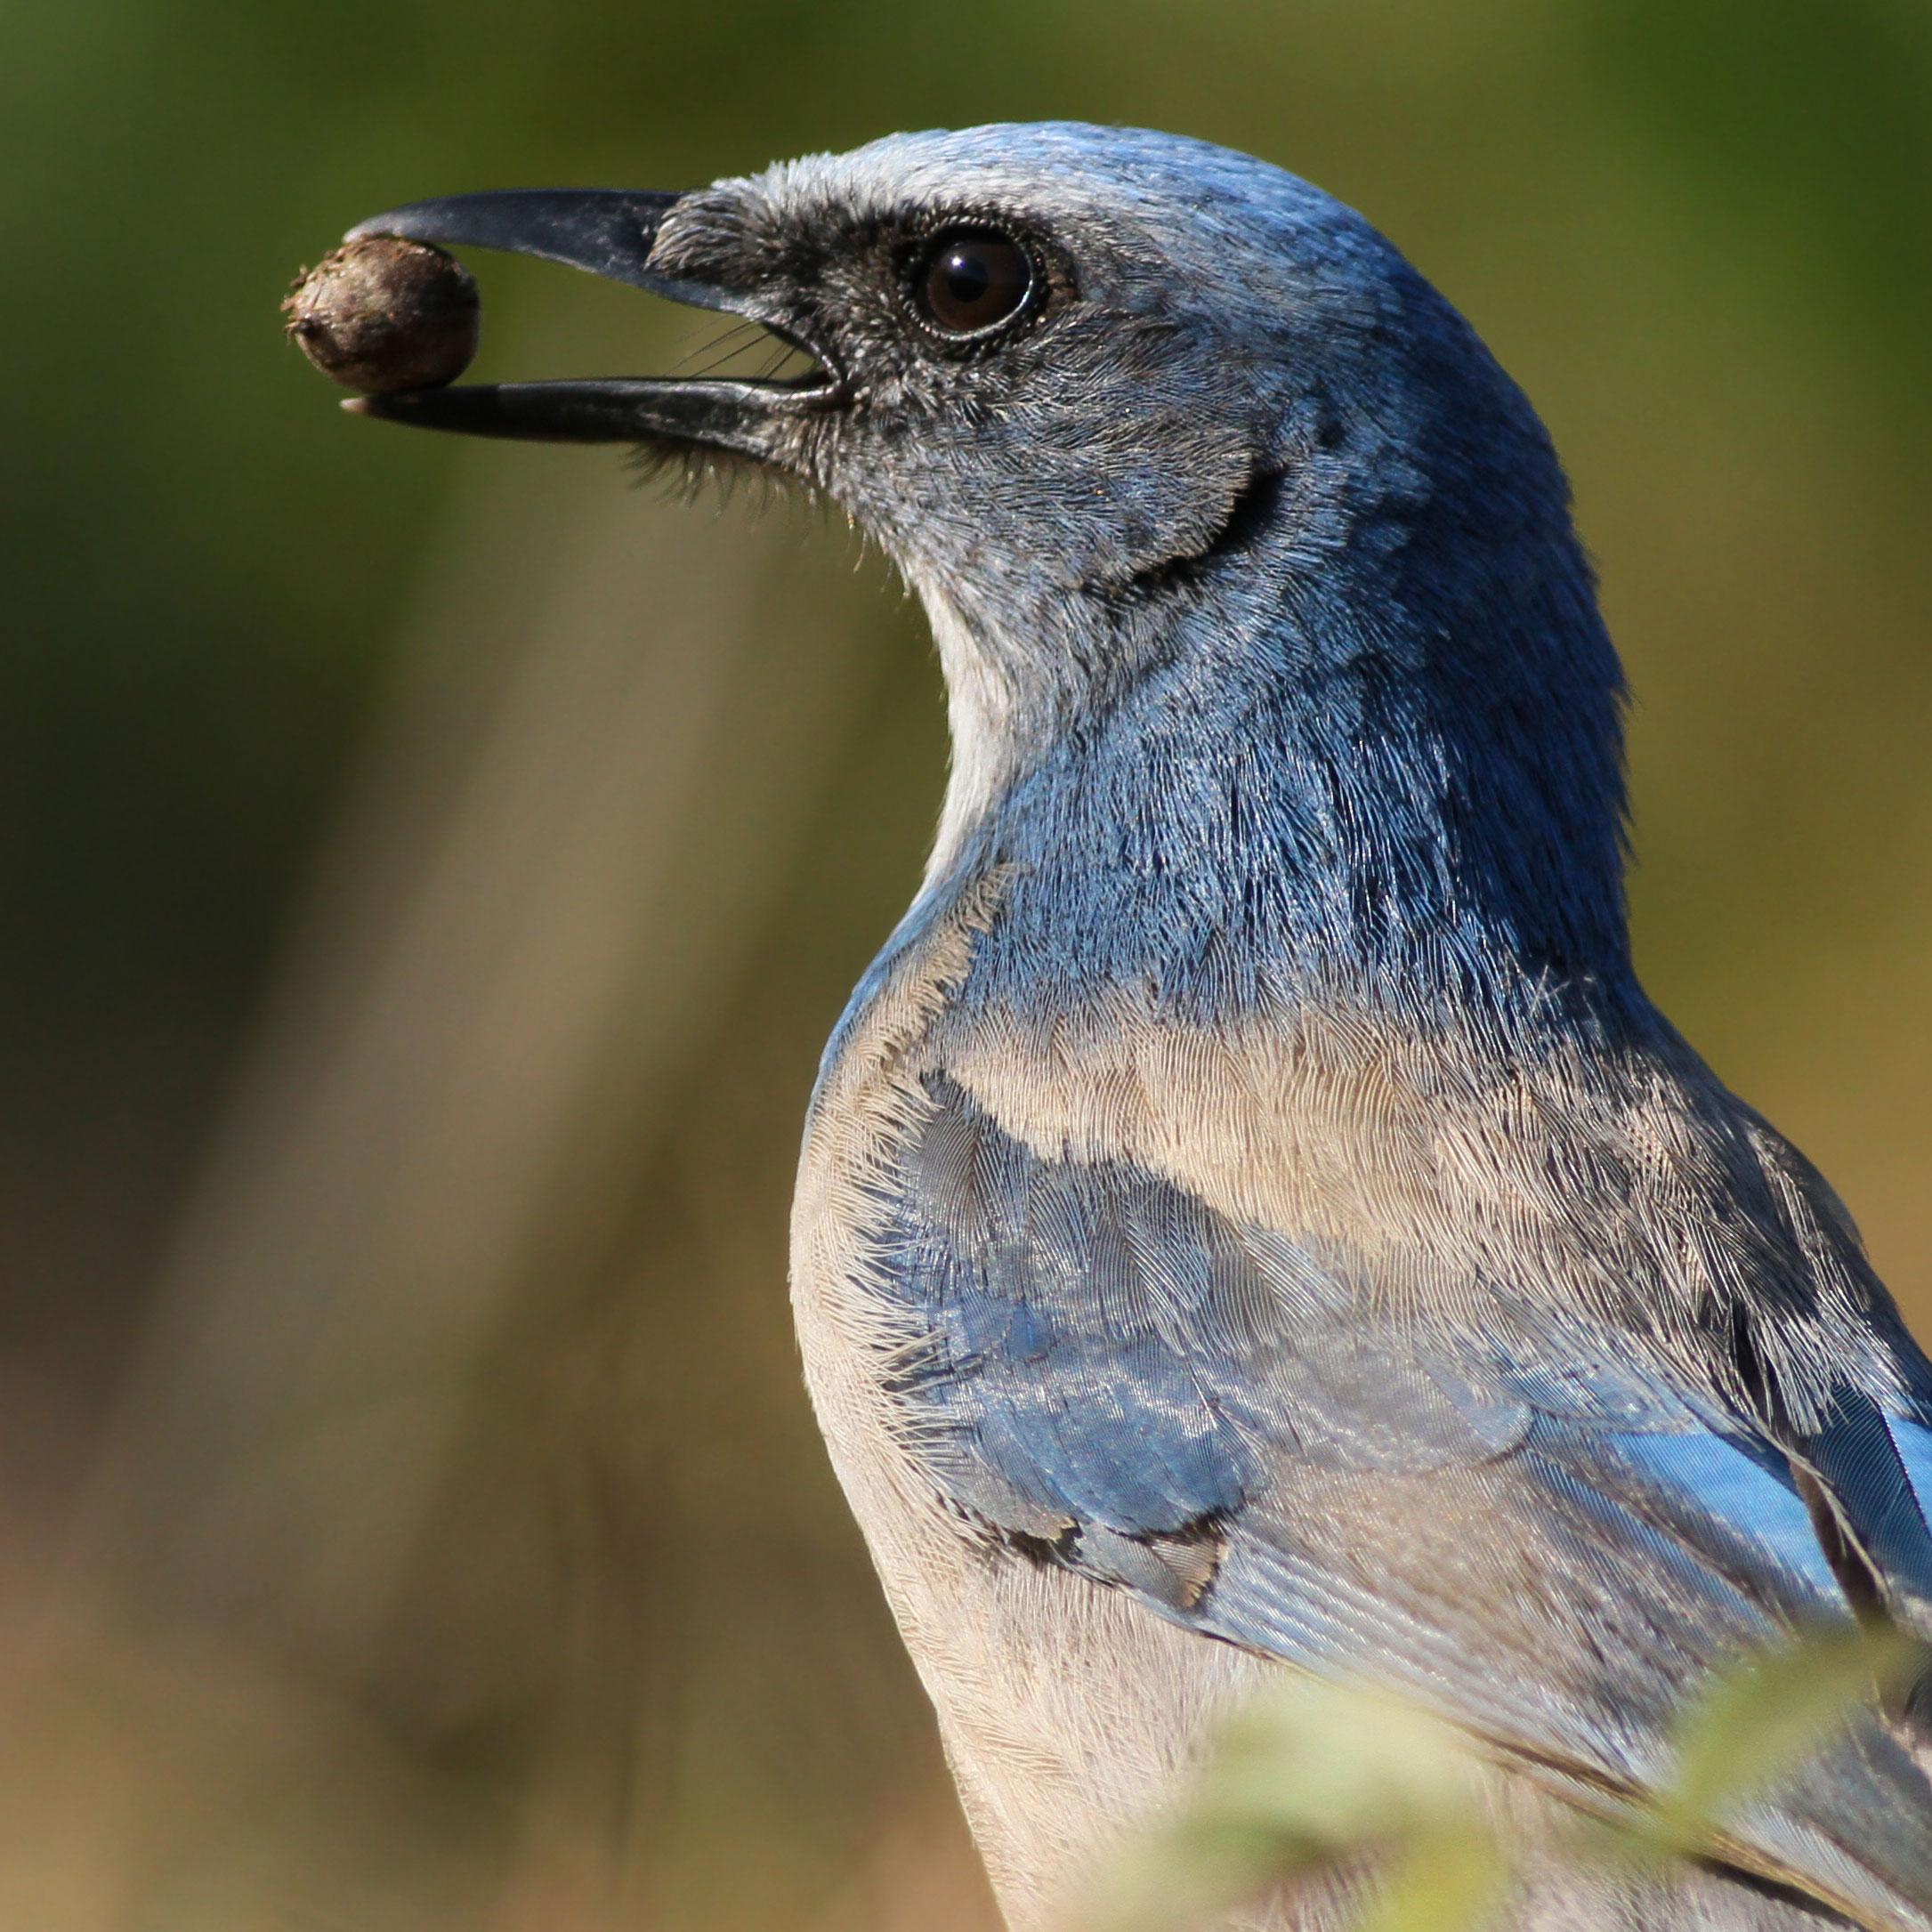 Florida Scrub-Jay eating an acorn. Sean Hollowell/Audubon Photography Awards